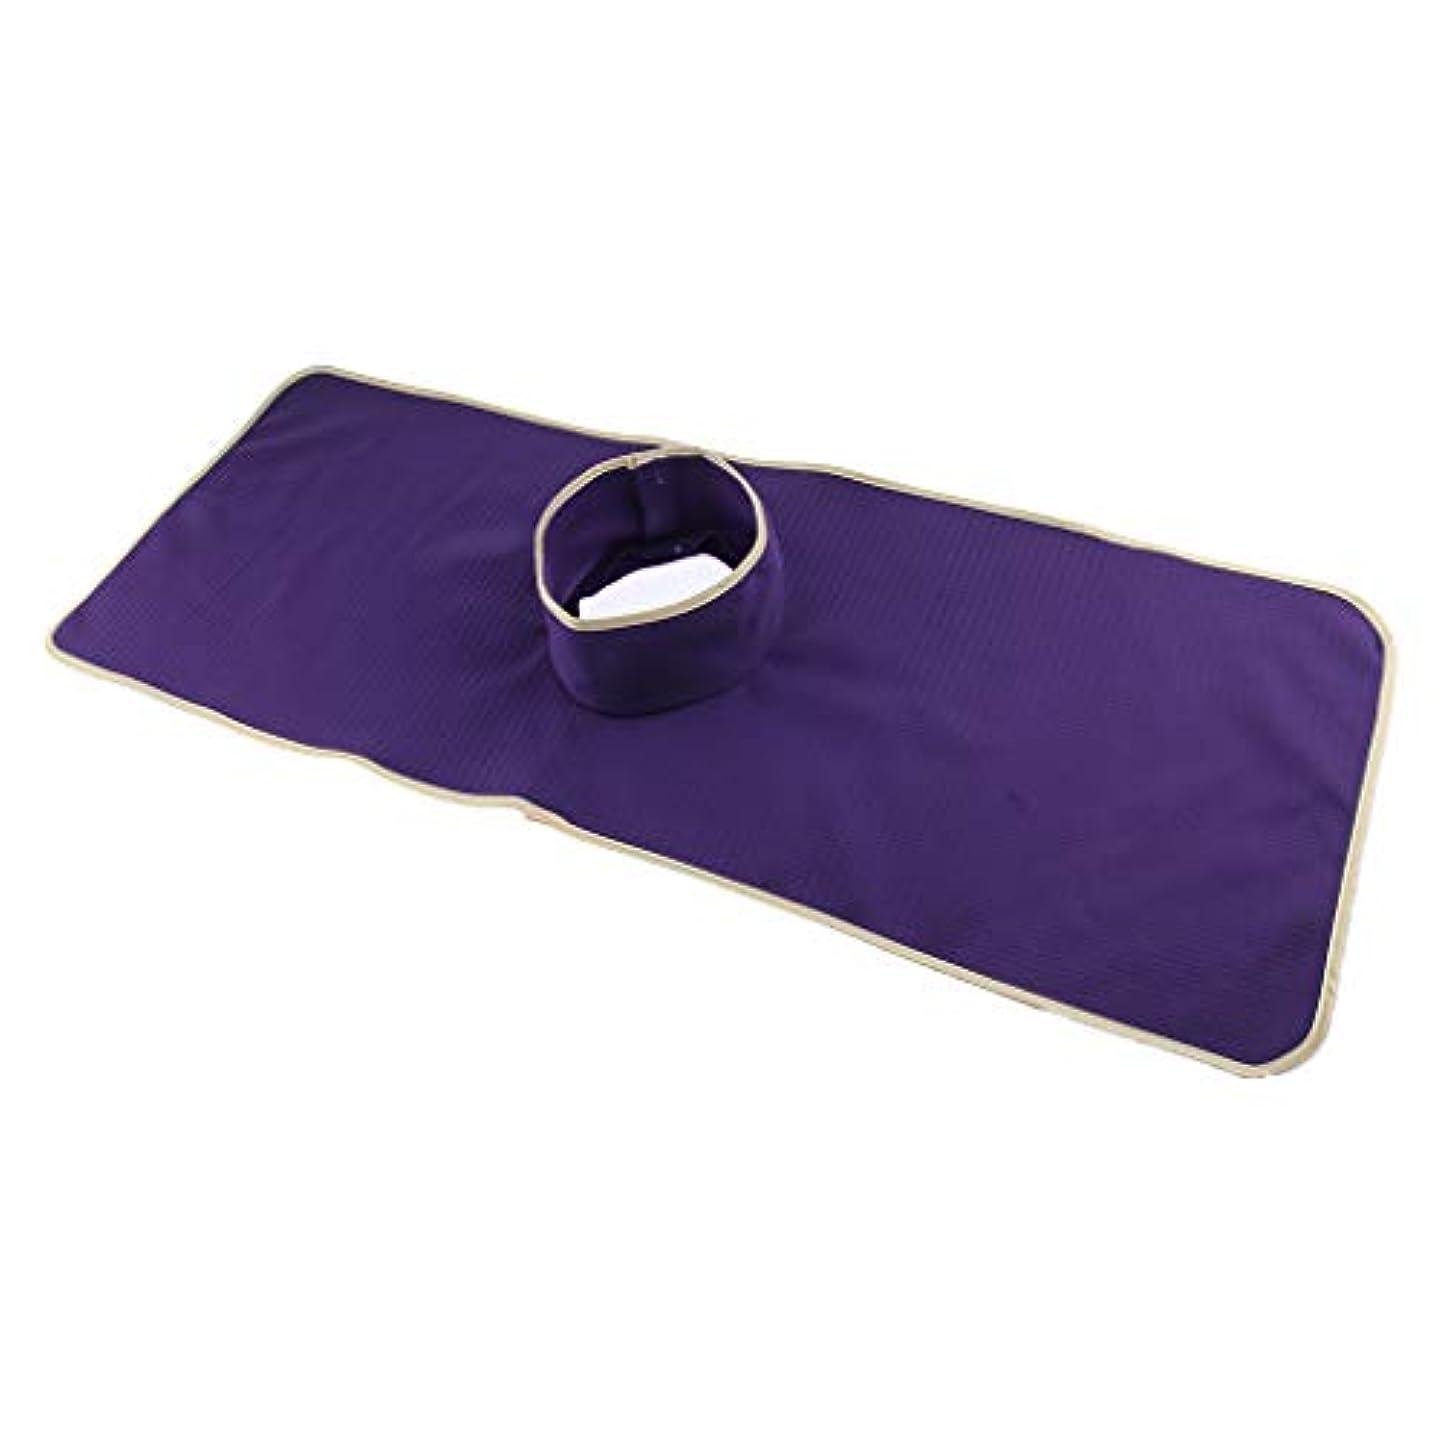 chiwanji 洗える指圧マッサージベッドタトゥーテーブルシートパッドマットフェイスホールカバー - 紫